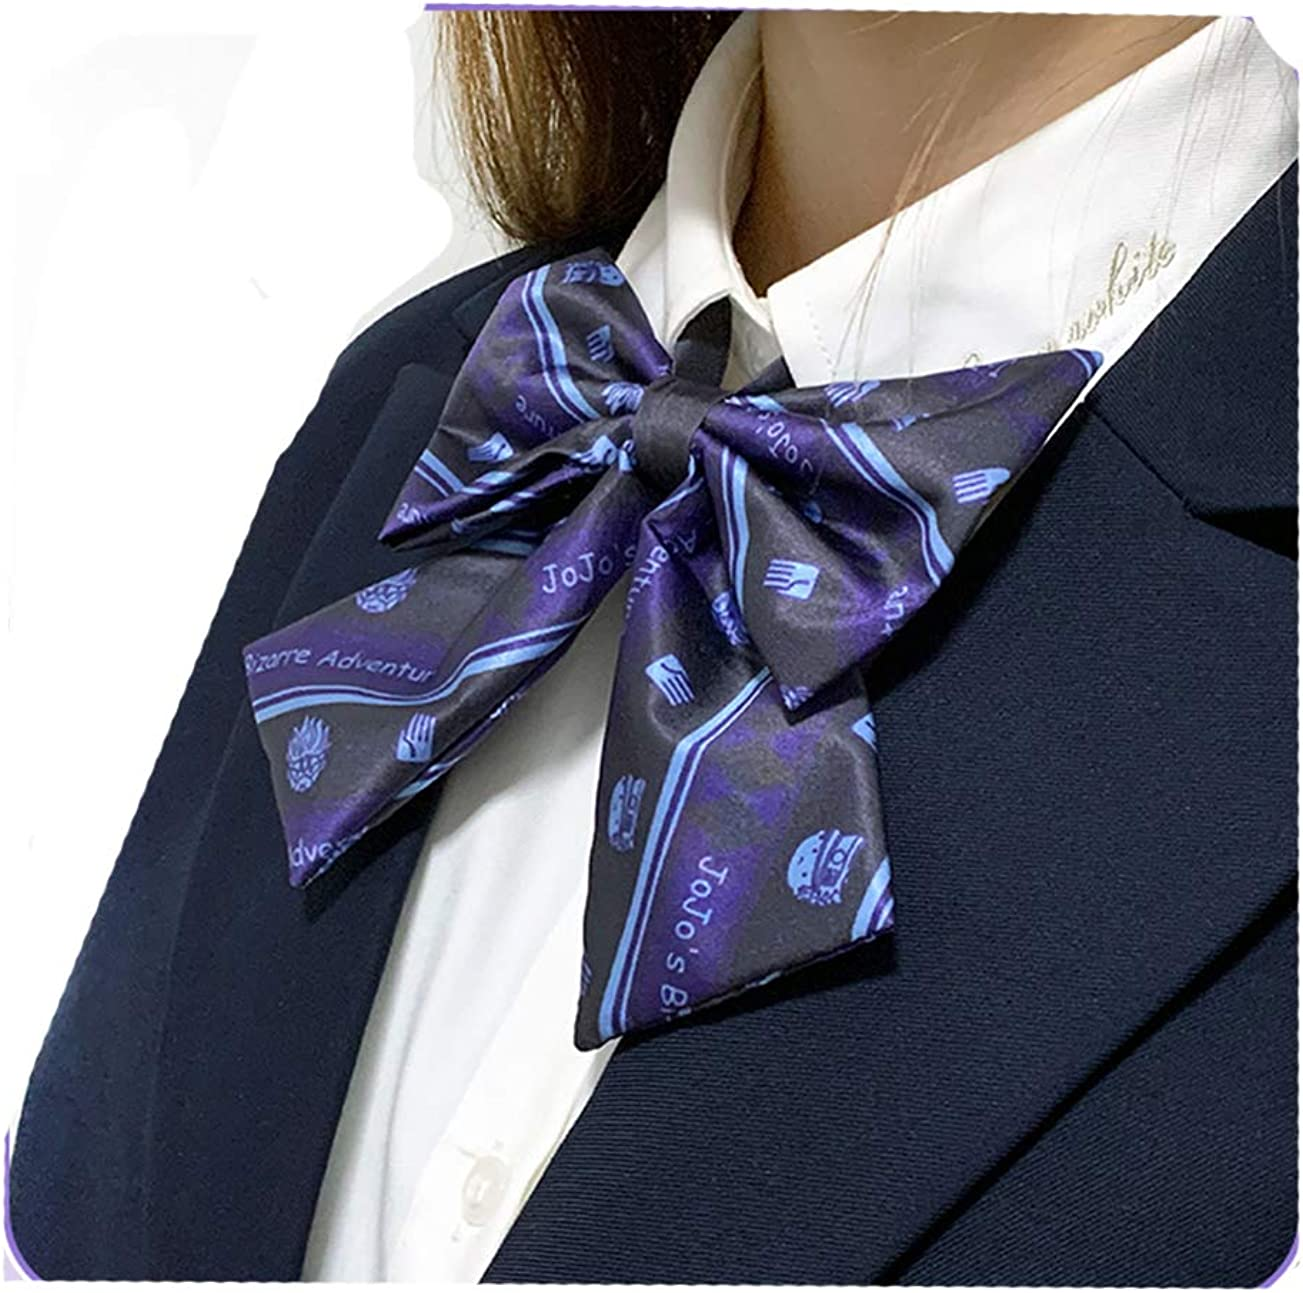 JoJos Bizarre Adventure Kujo Jotaro Kira Yoshikage tie bowknot bow tie Fanart cosplay props